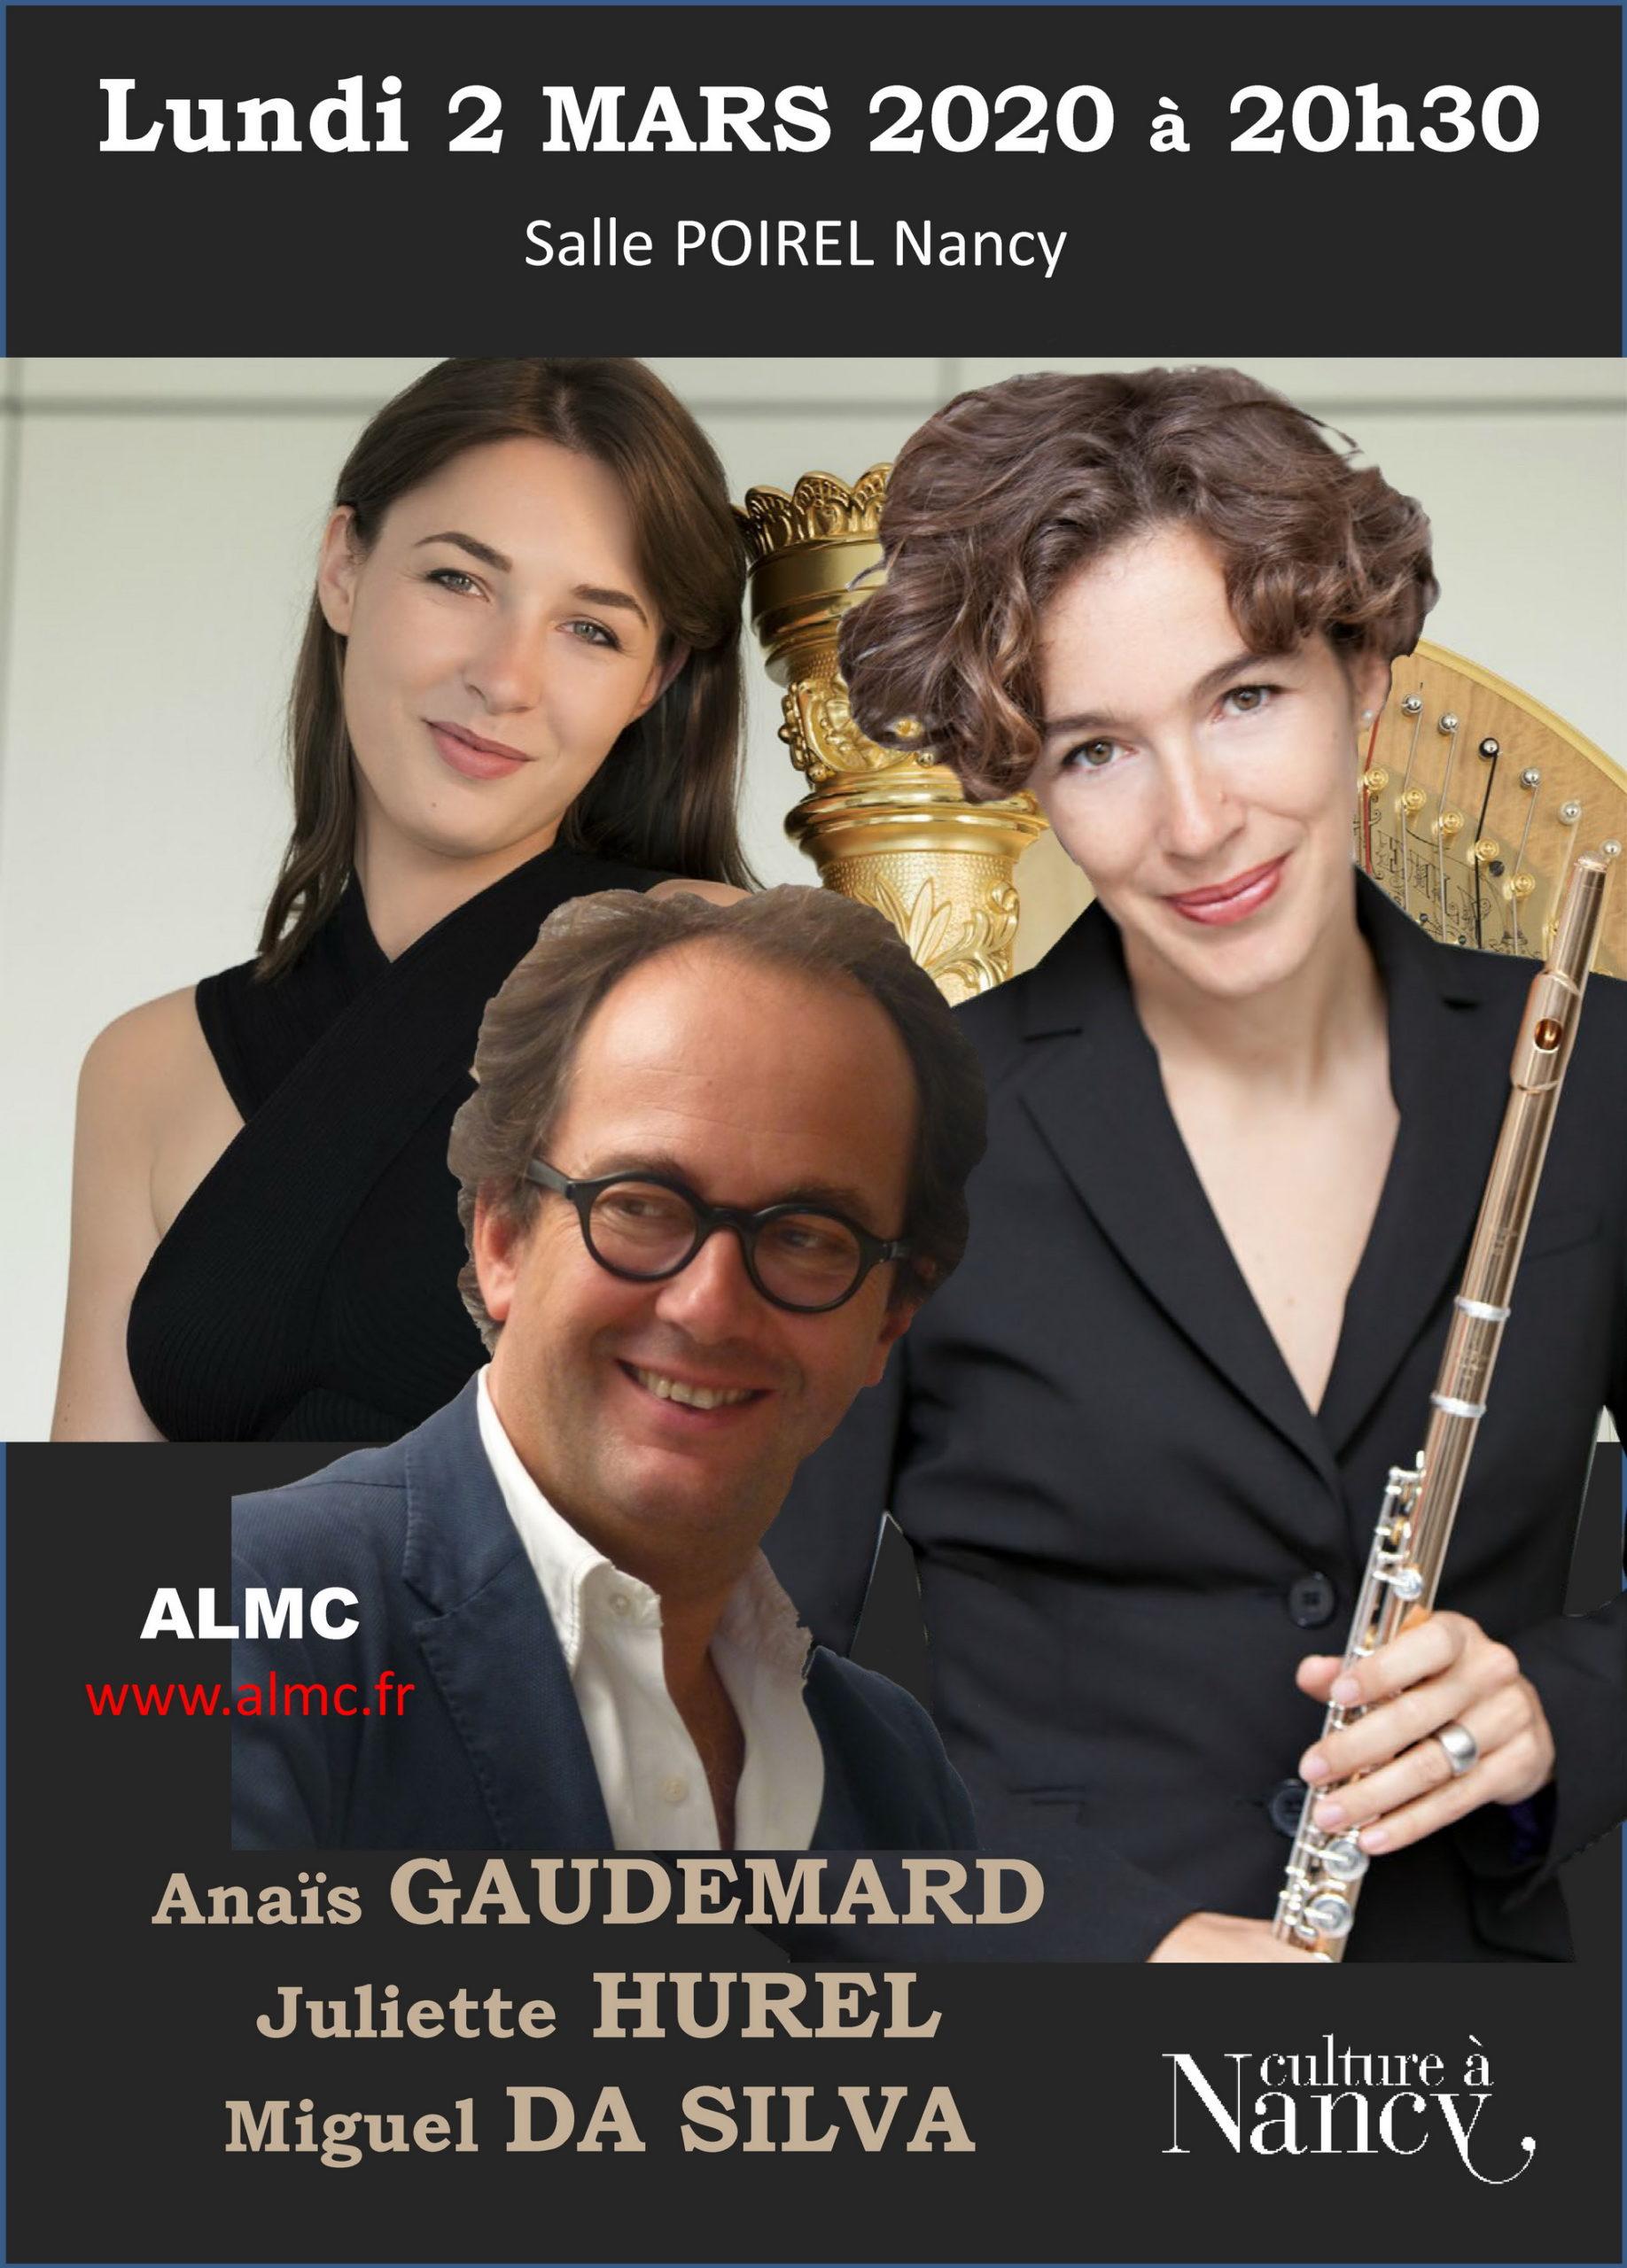 CONCERT TRIO ANAÏS GAUDEMARD